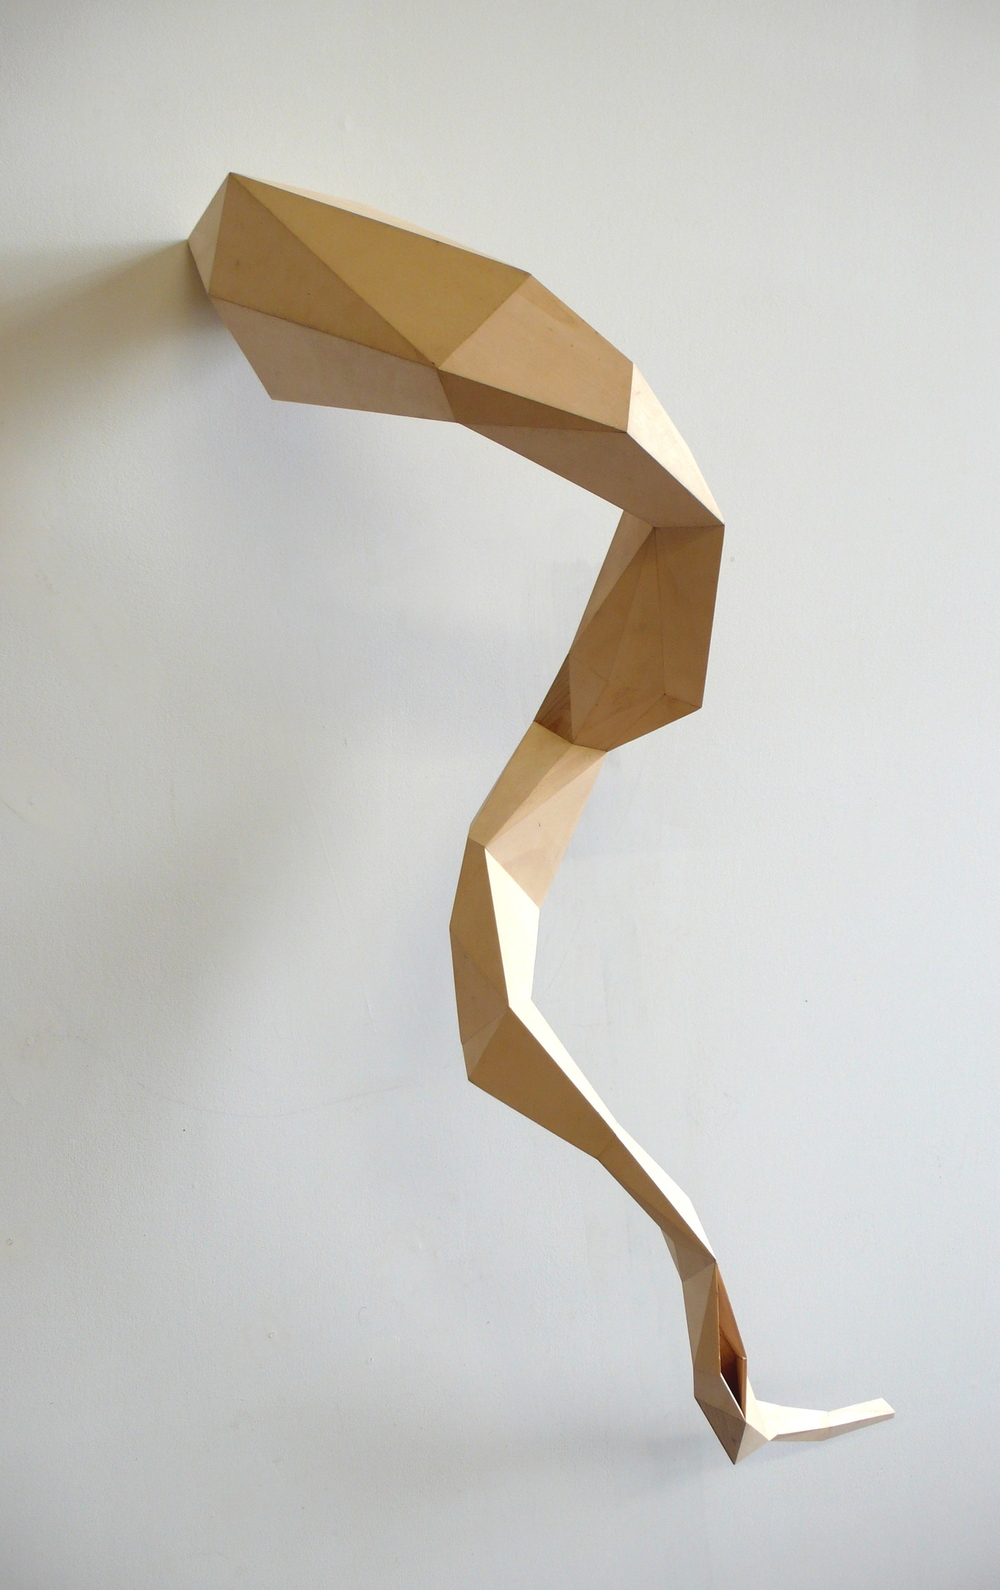 plychord sculpture, poplar